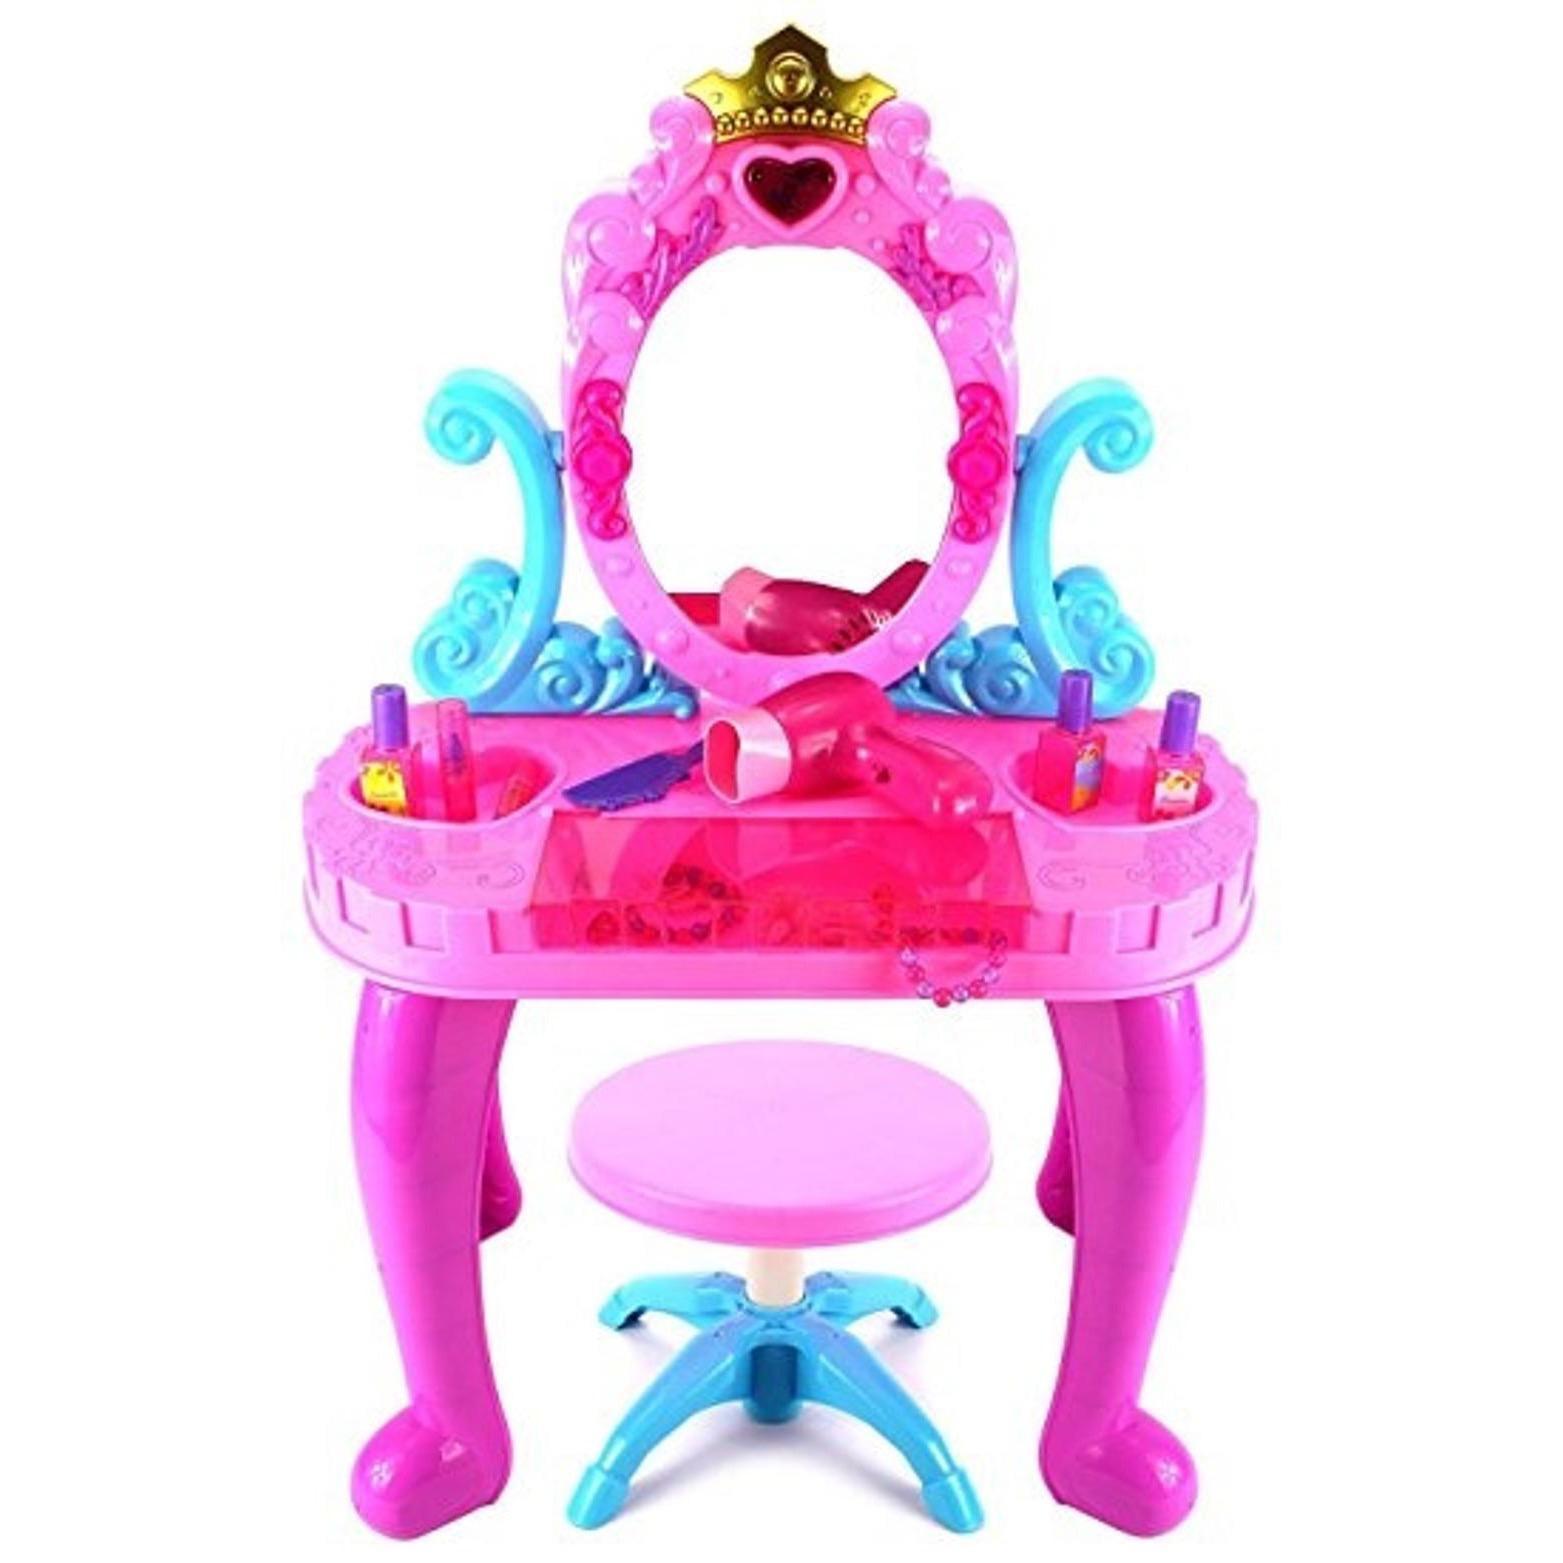 Mainan Meja Rias Beauty Dressing Table No.661-39